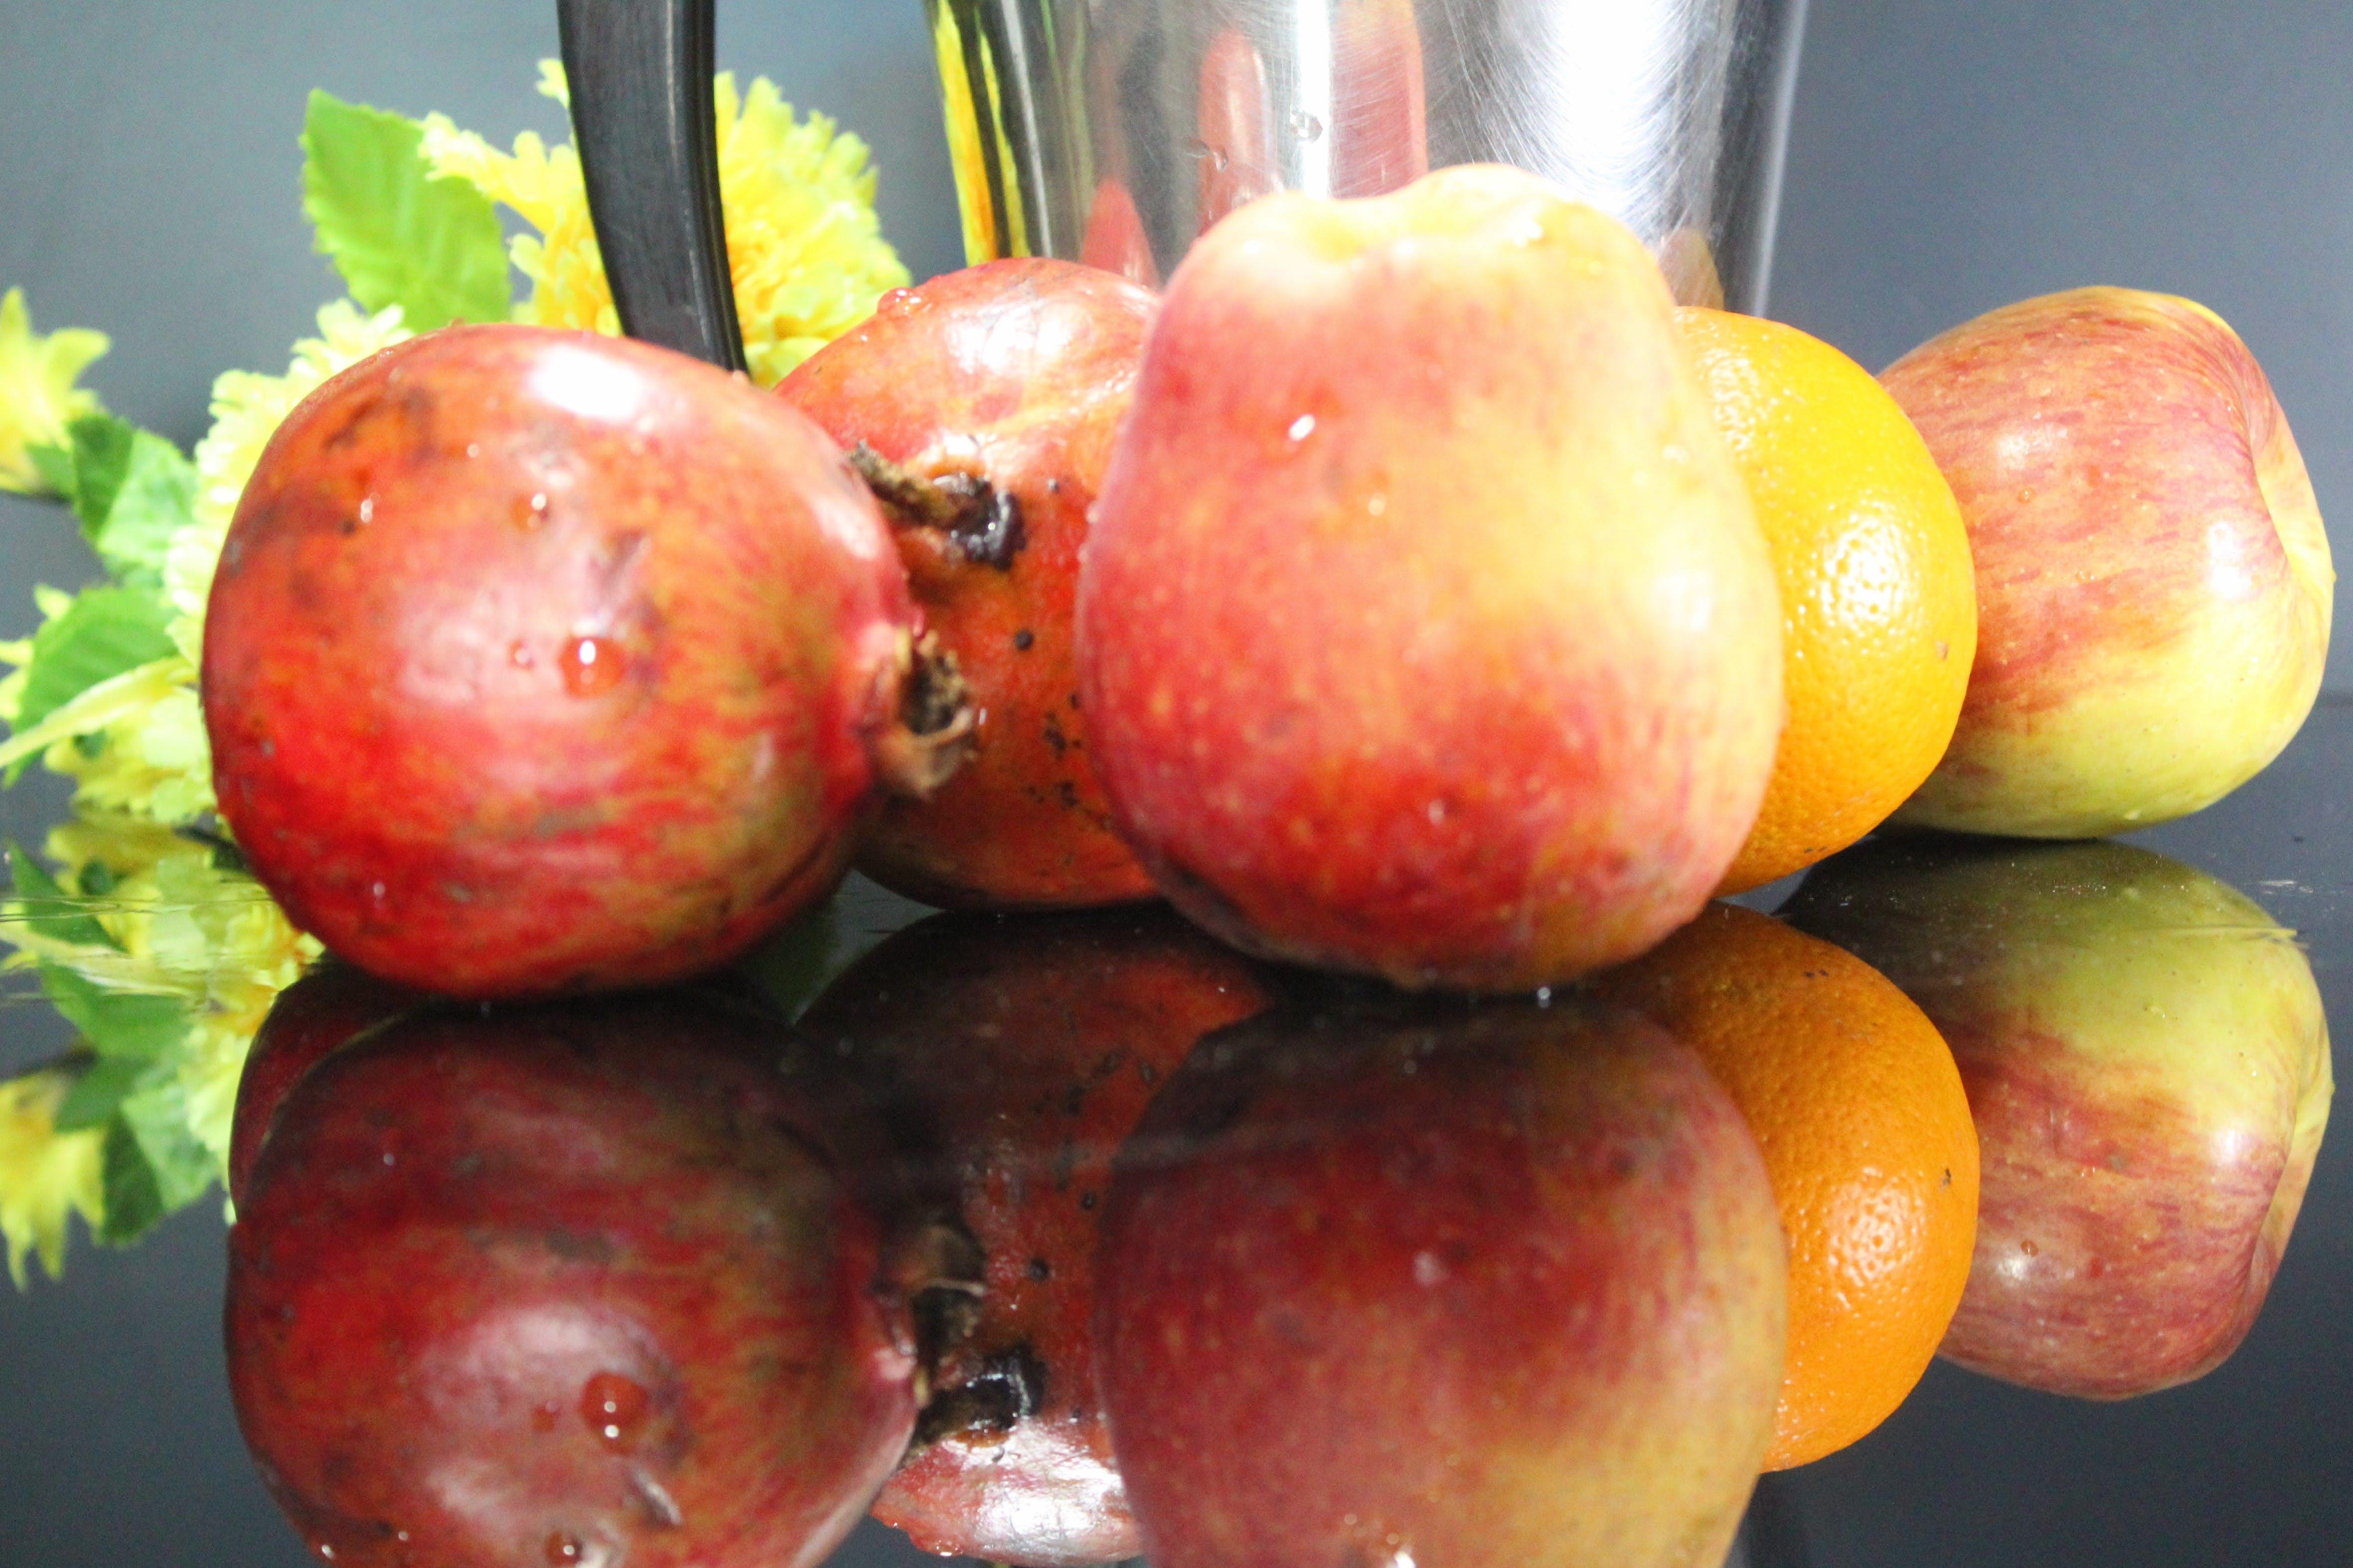 Kostenloses Stock Foto zu frisches obst, früchtekorb, fruchtsaft, fruchtsalat